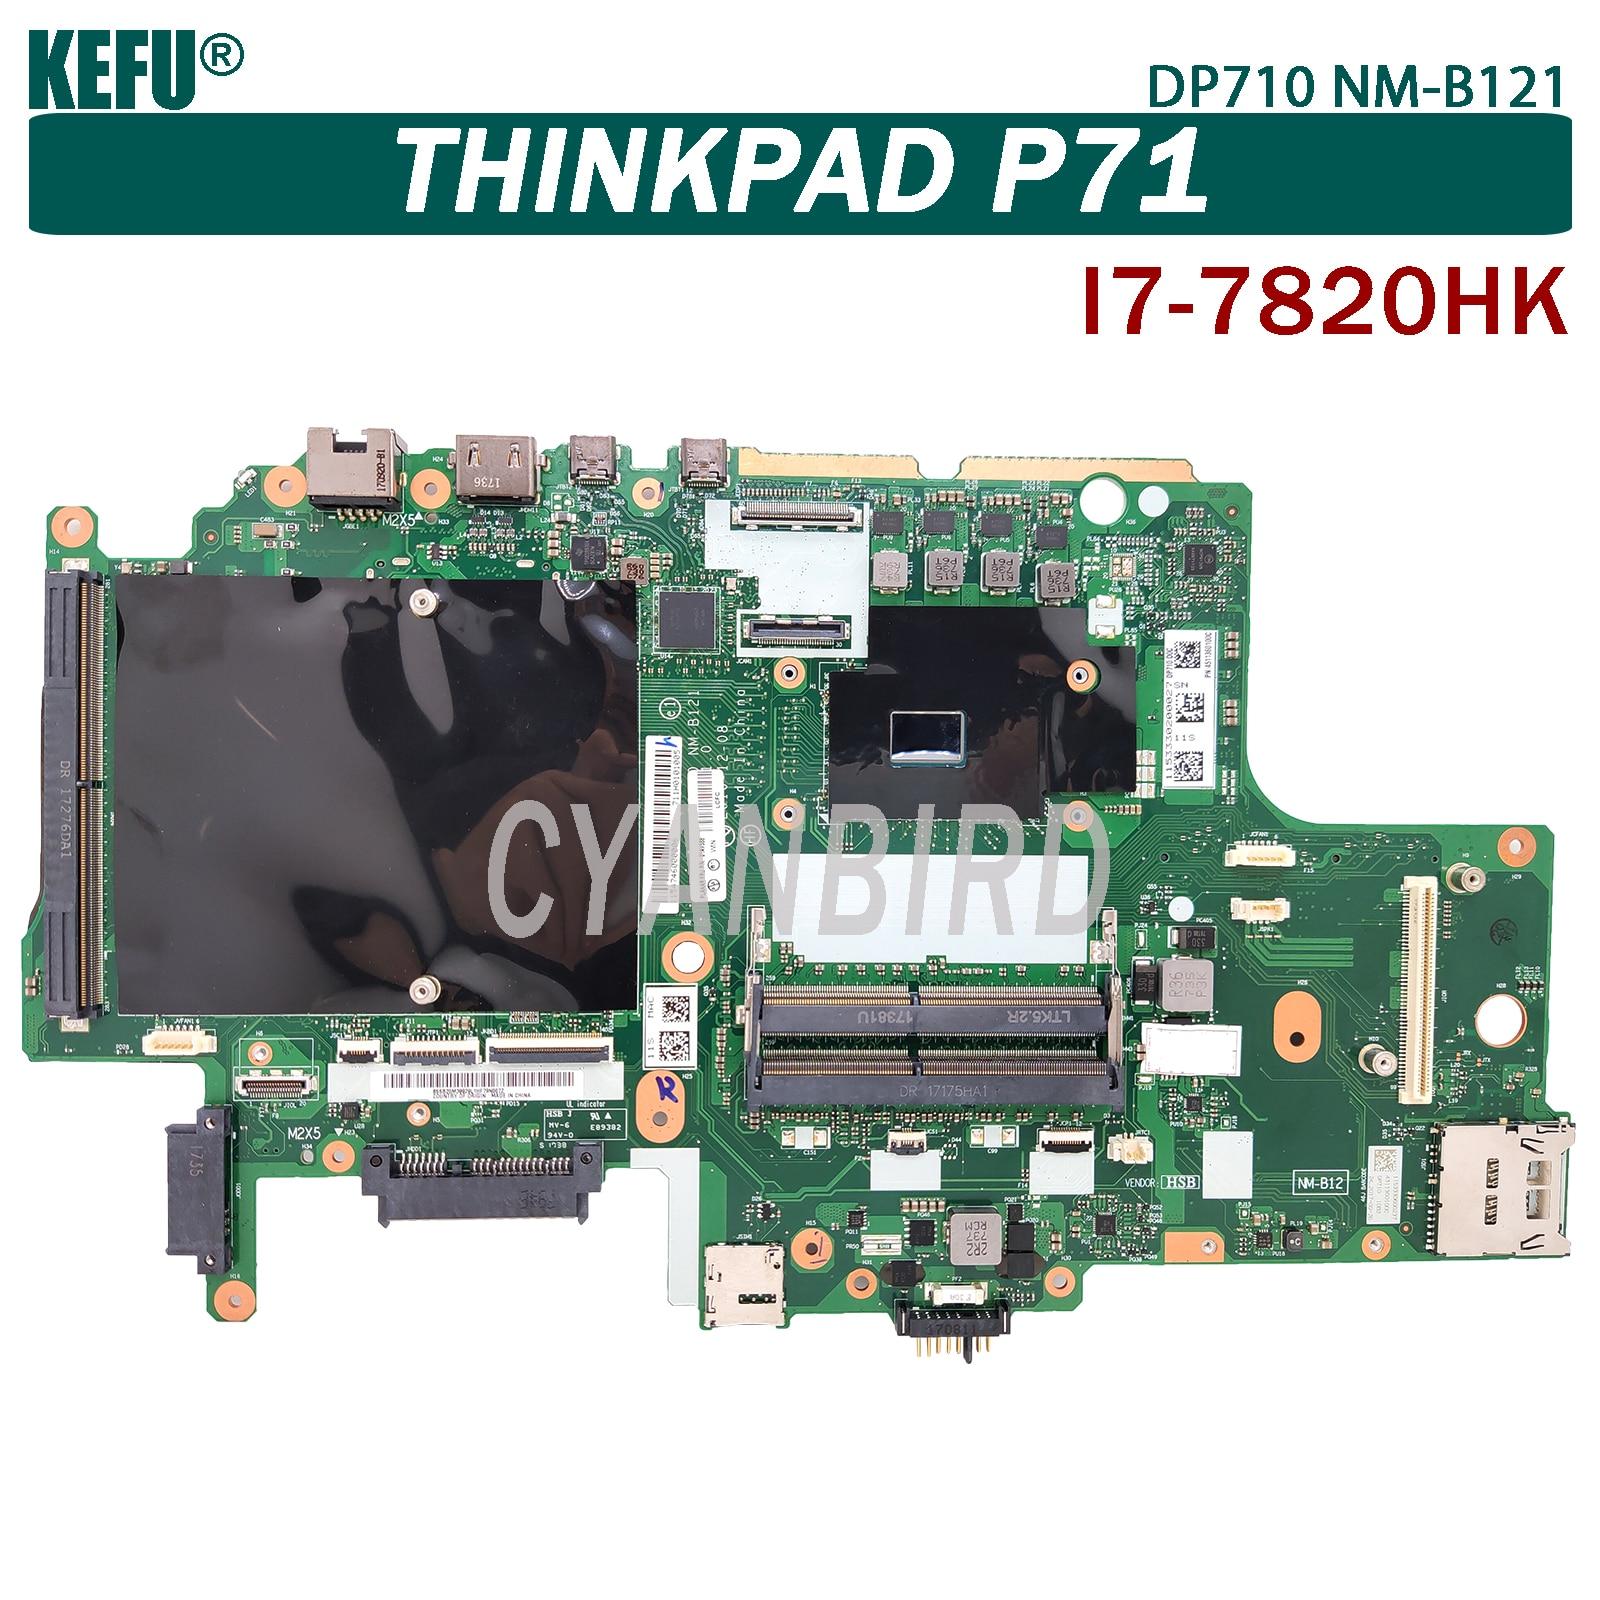 KEFU DP710 NM-B121 اللوحة الرئيسية الأصلية لينوفو ثينك باد P71 مع I7-7820HK اللوحة الأم للكمبيوتر المحمول